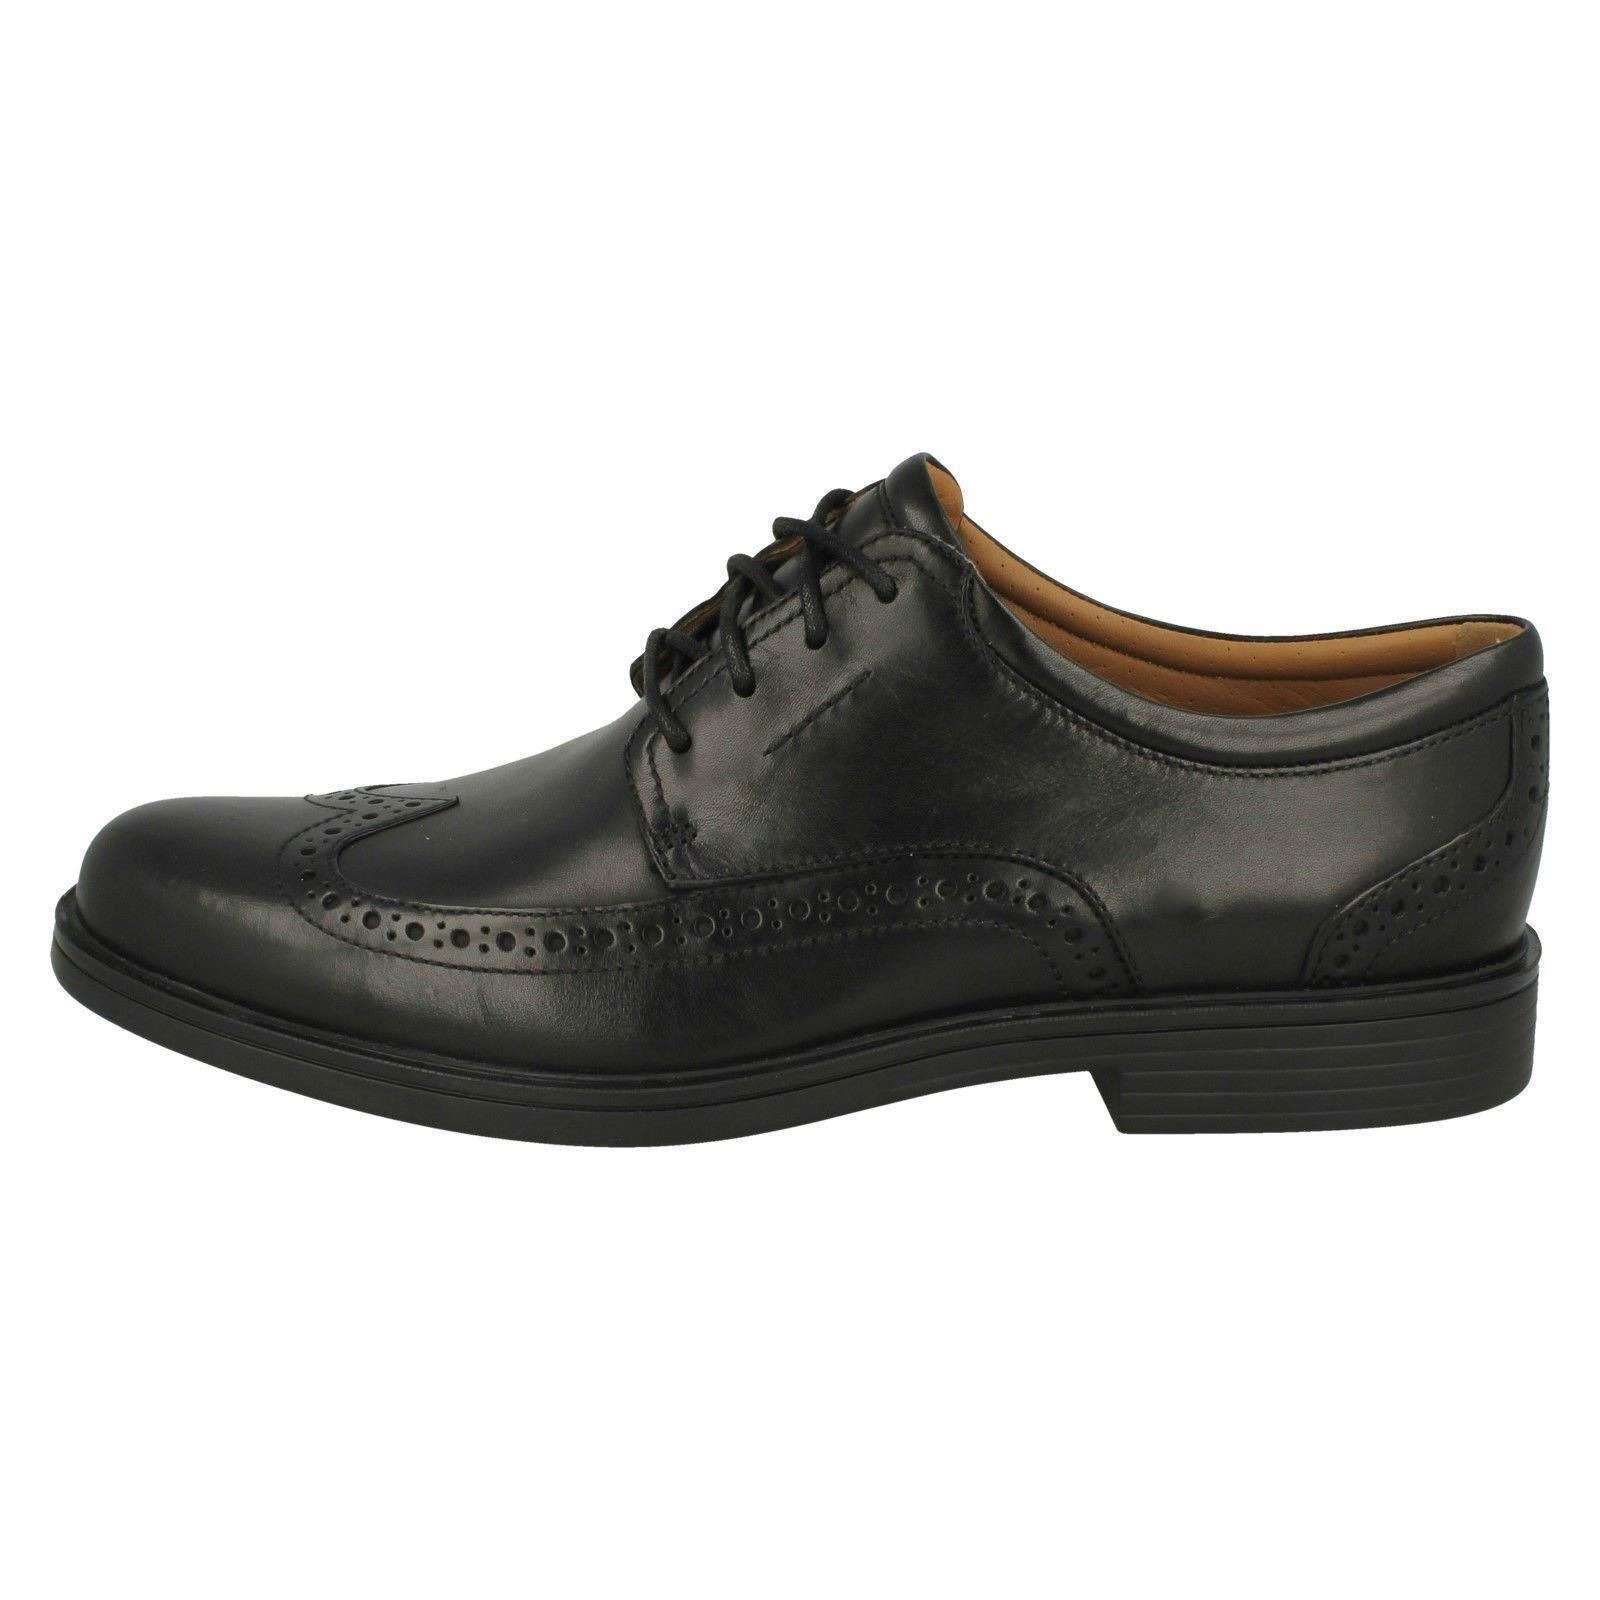 Men's Unstructured by Clarks Brogue Smart Shoes Un Aldric Wing